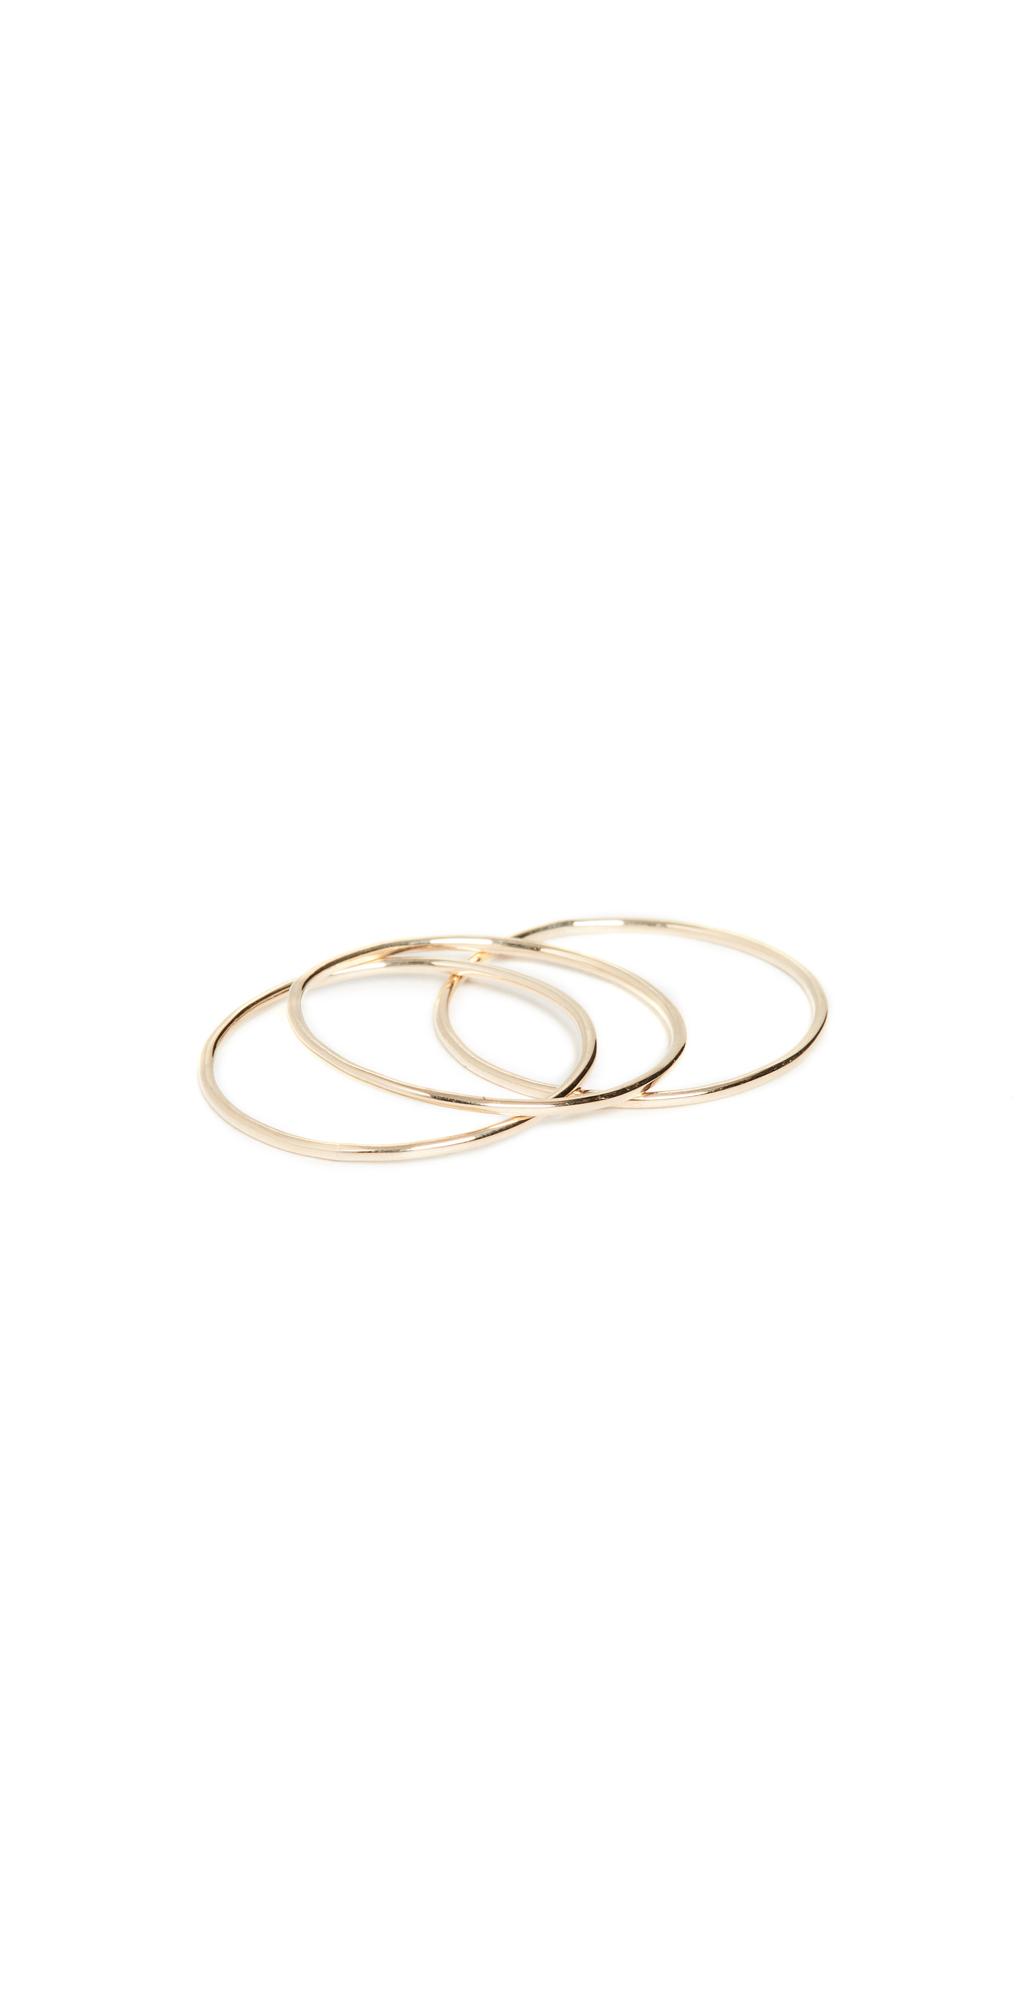 14k Paper Thin Rings